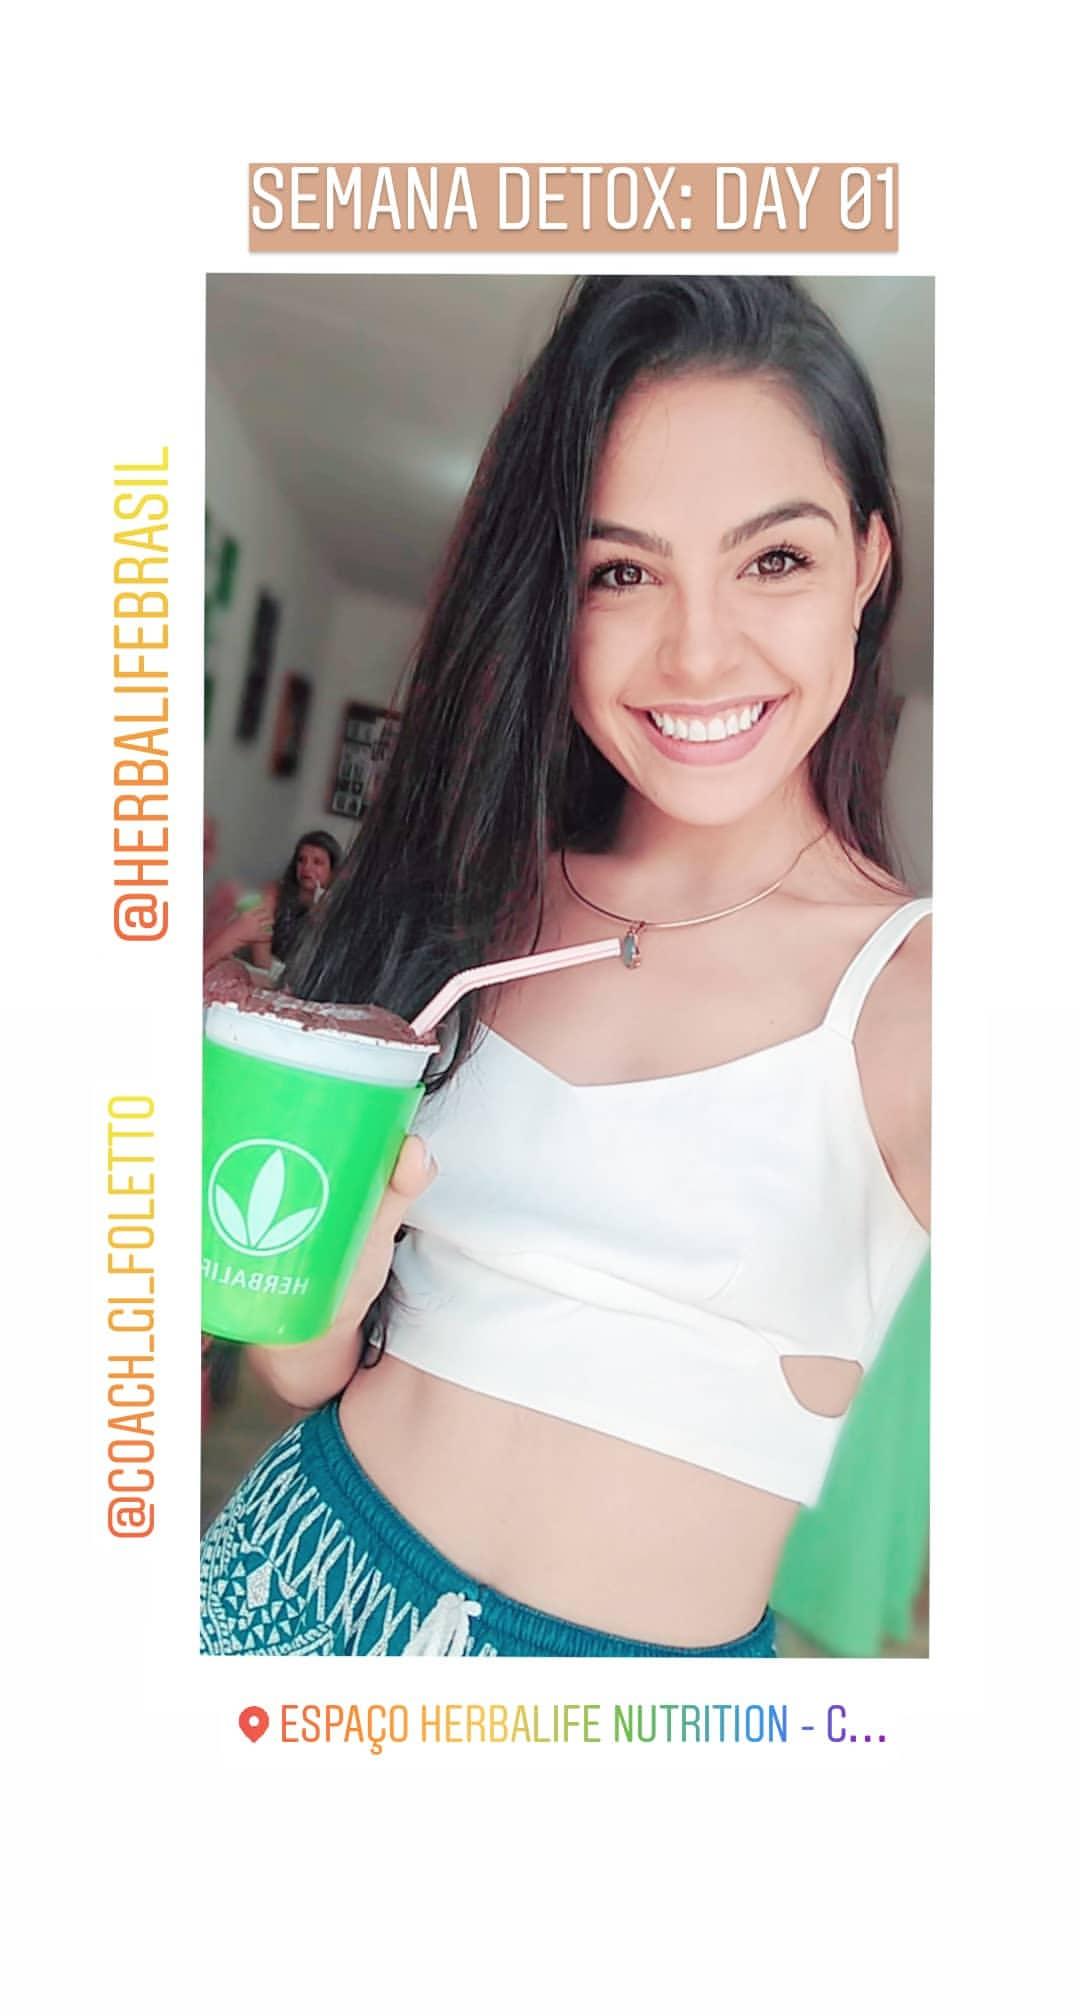 amanda brenner, miss hispanoamericana brasil 2019/top 2 de miss grand brasil 2019/top 2 de rainha da pecuaria internacional 2018. - Página 4 51977610